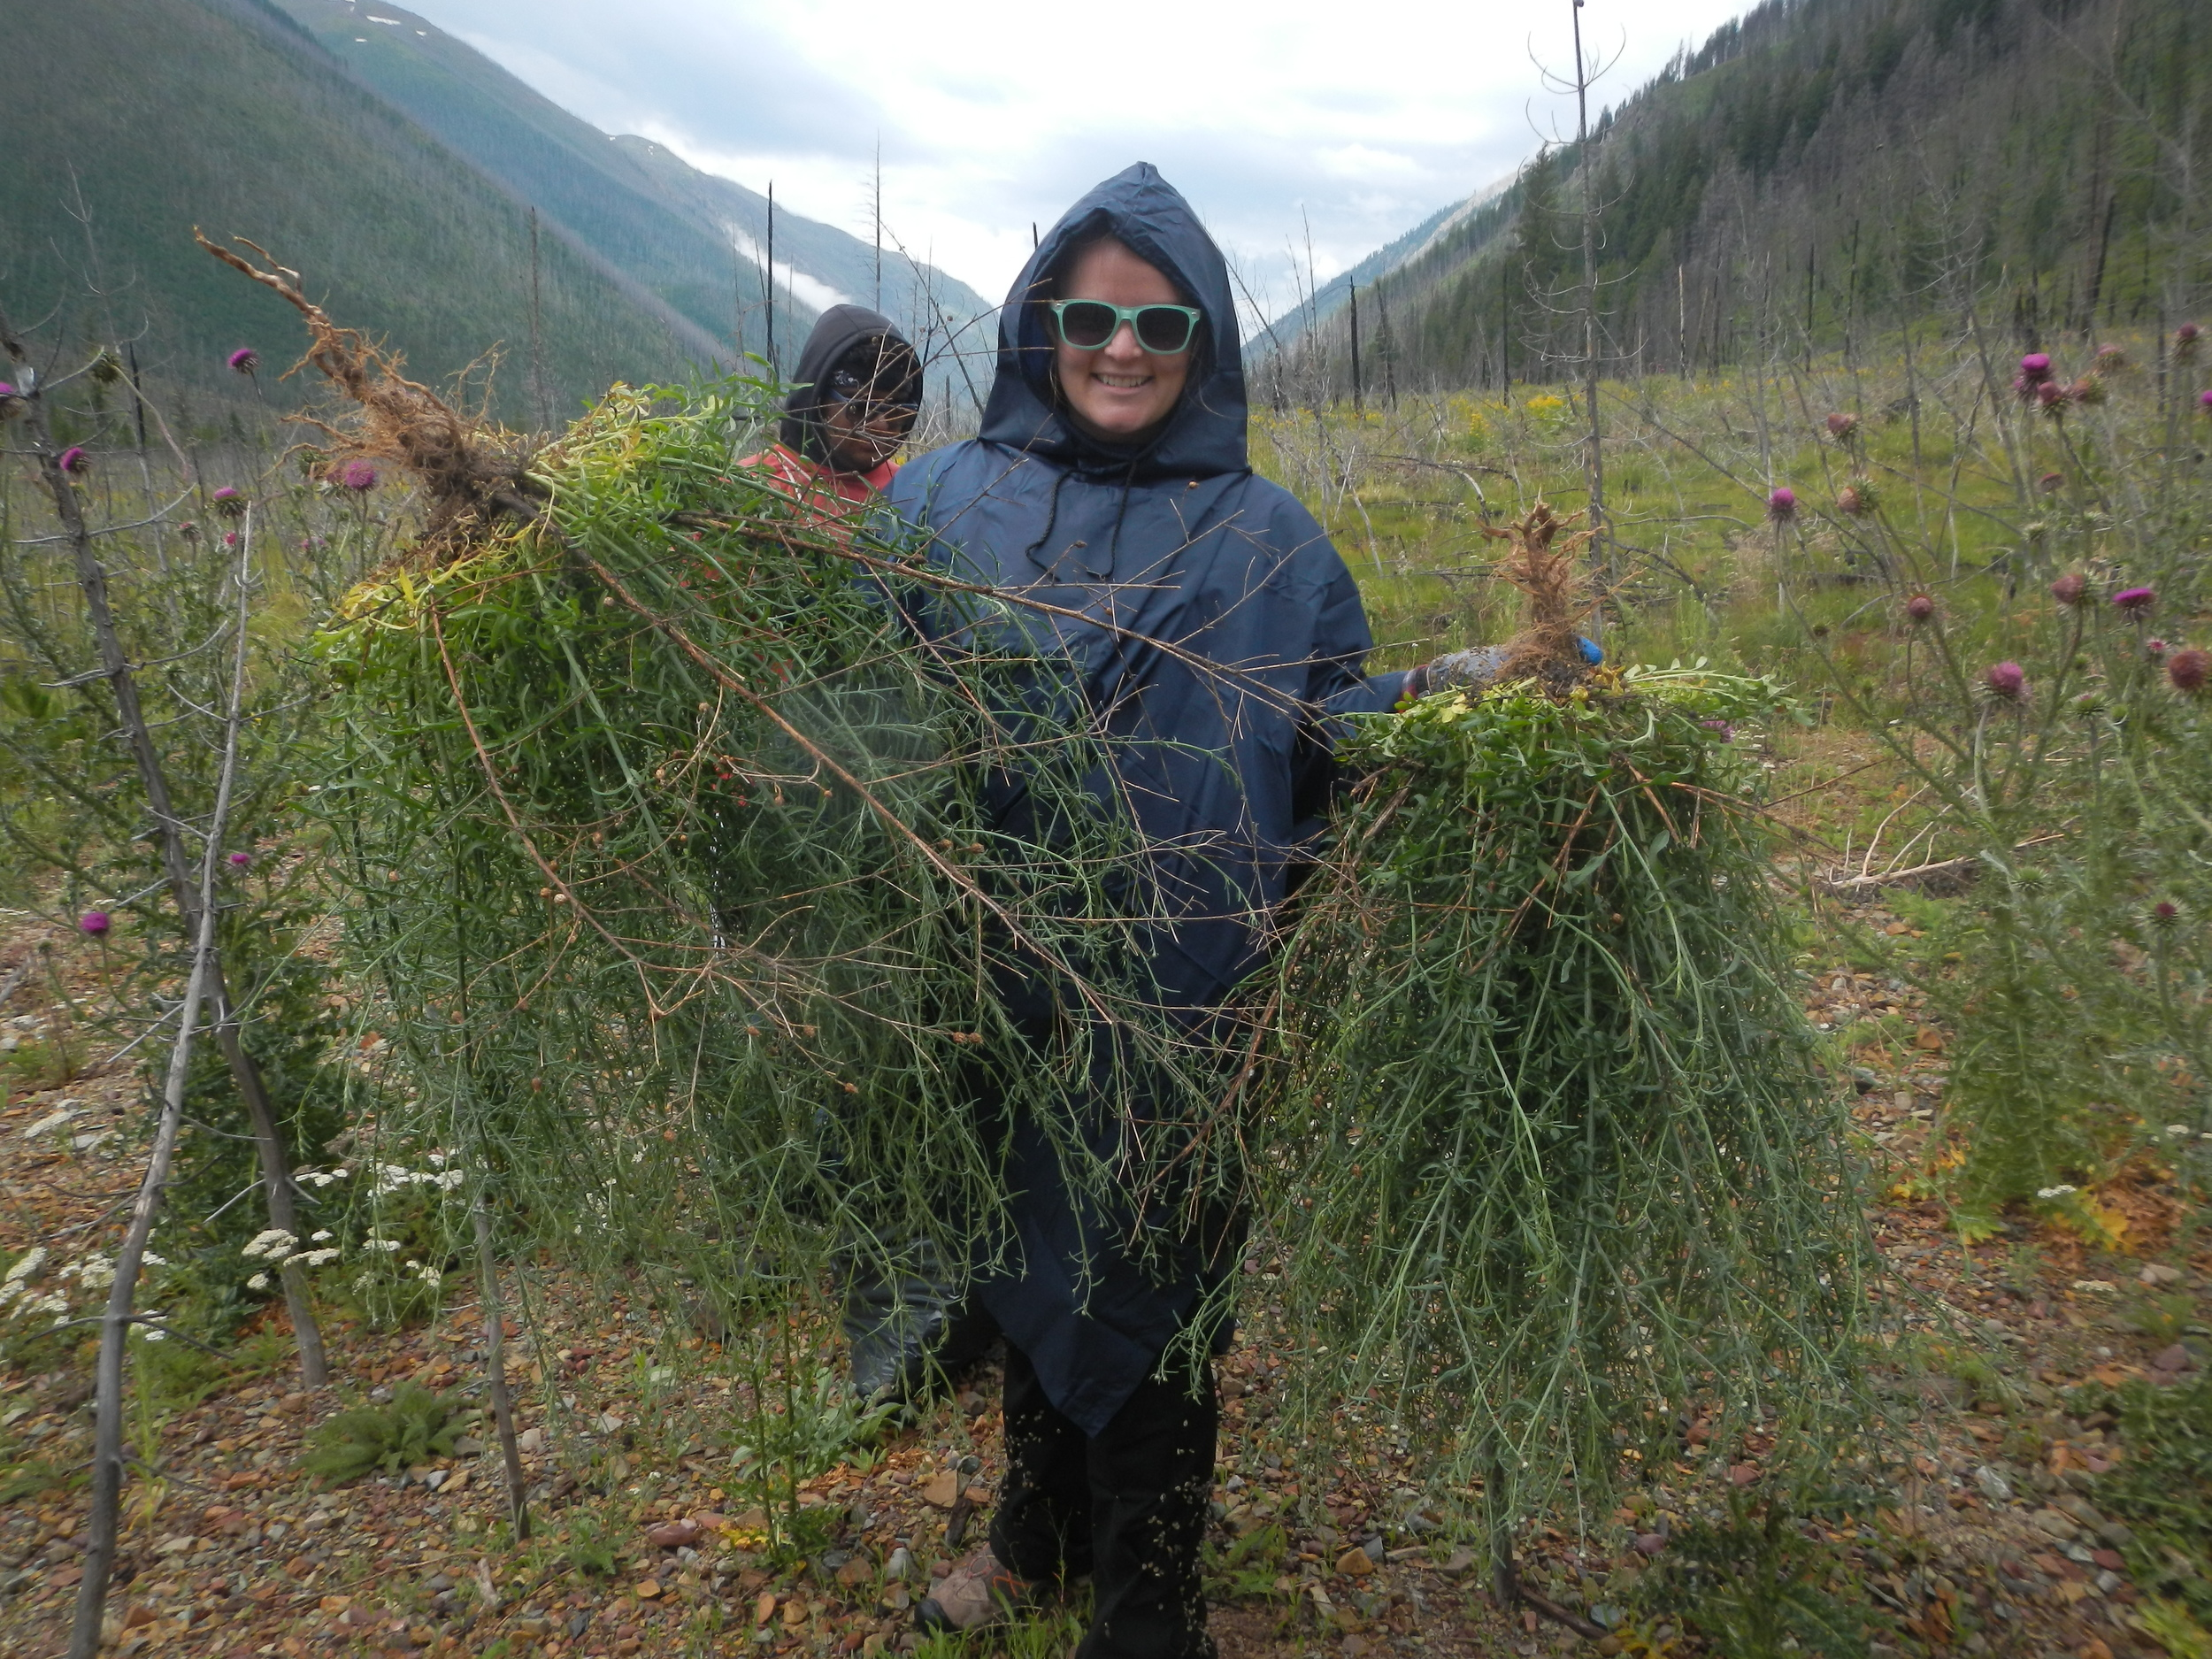 INVASIVE WEEDS MANAGEMENT TO PROTECT WILDLIFE HABITAT